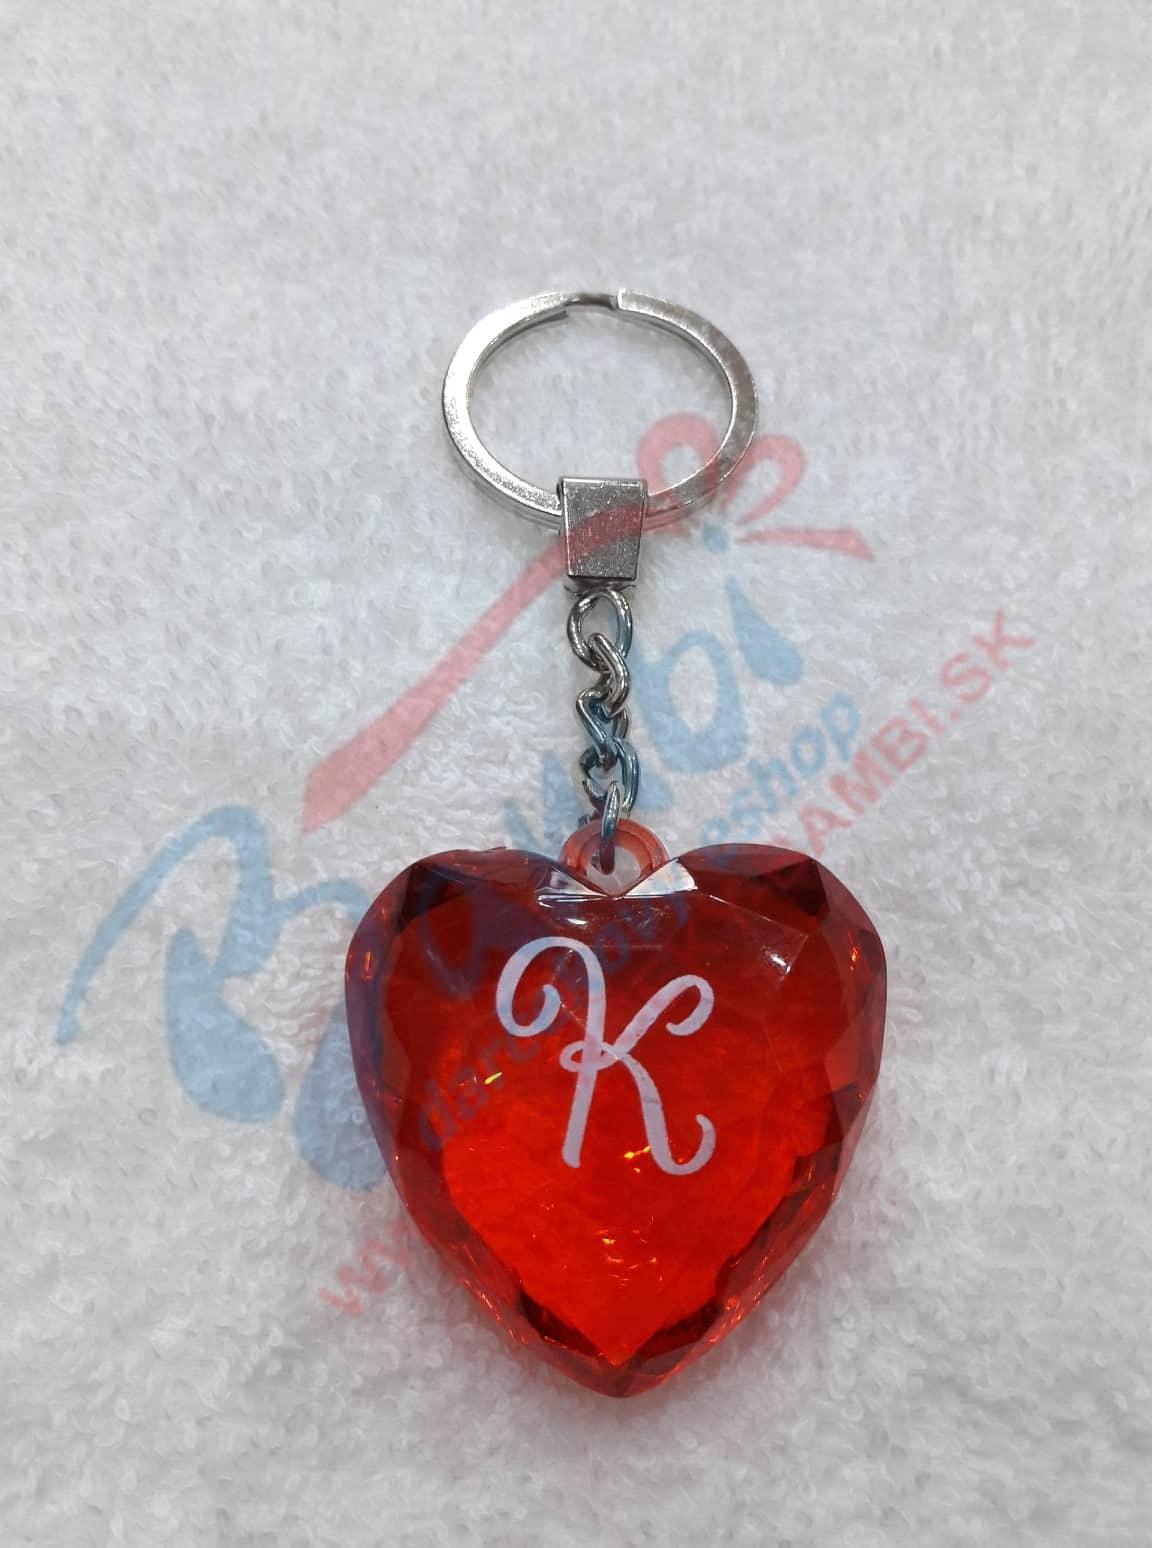 eb4c85b86 Kľúčenka K